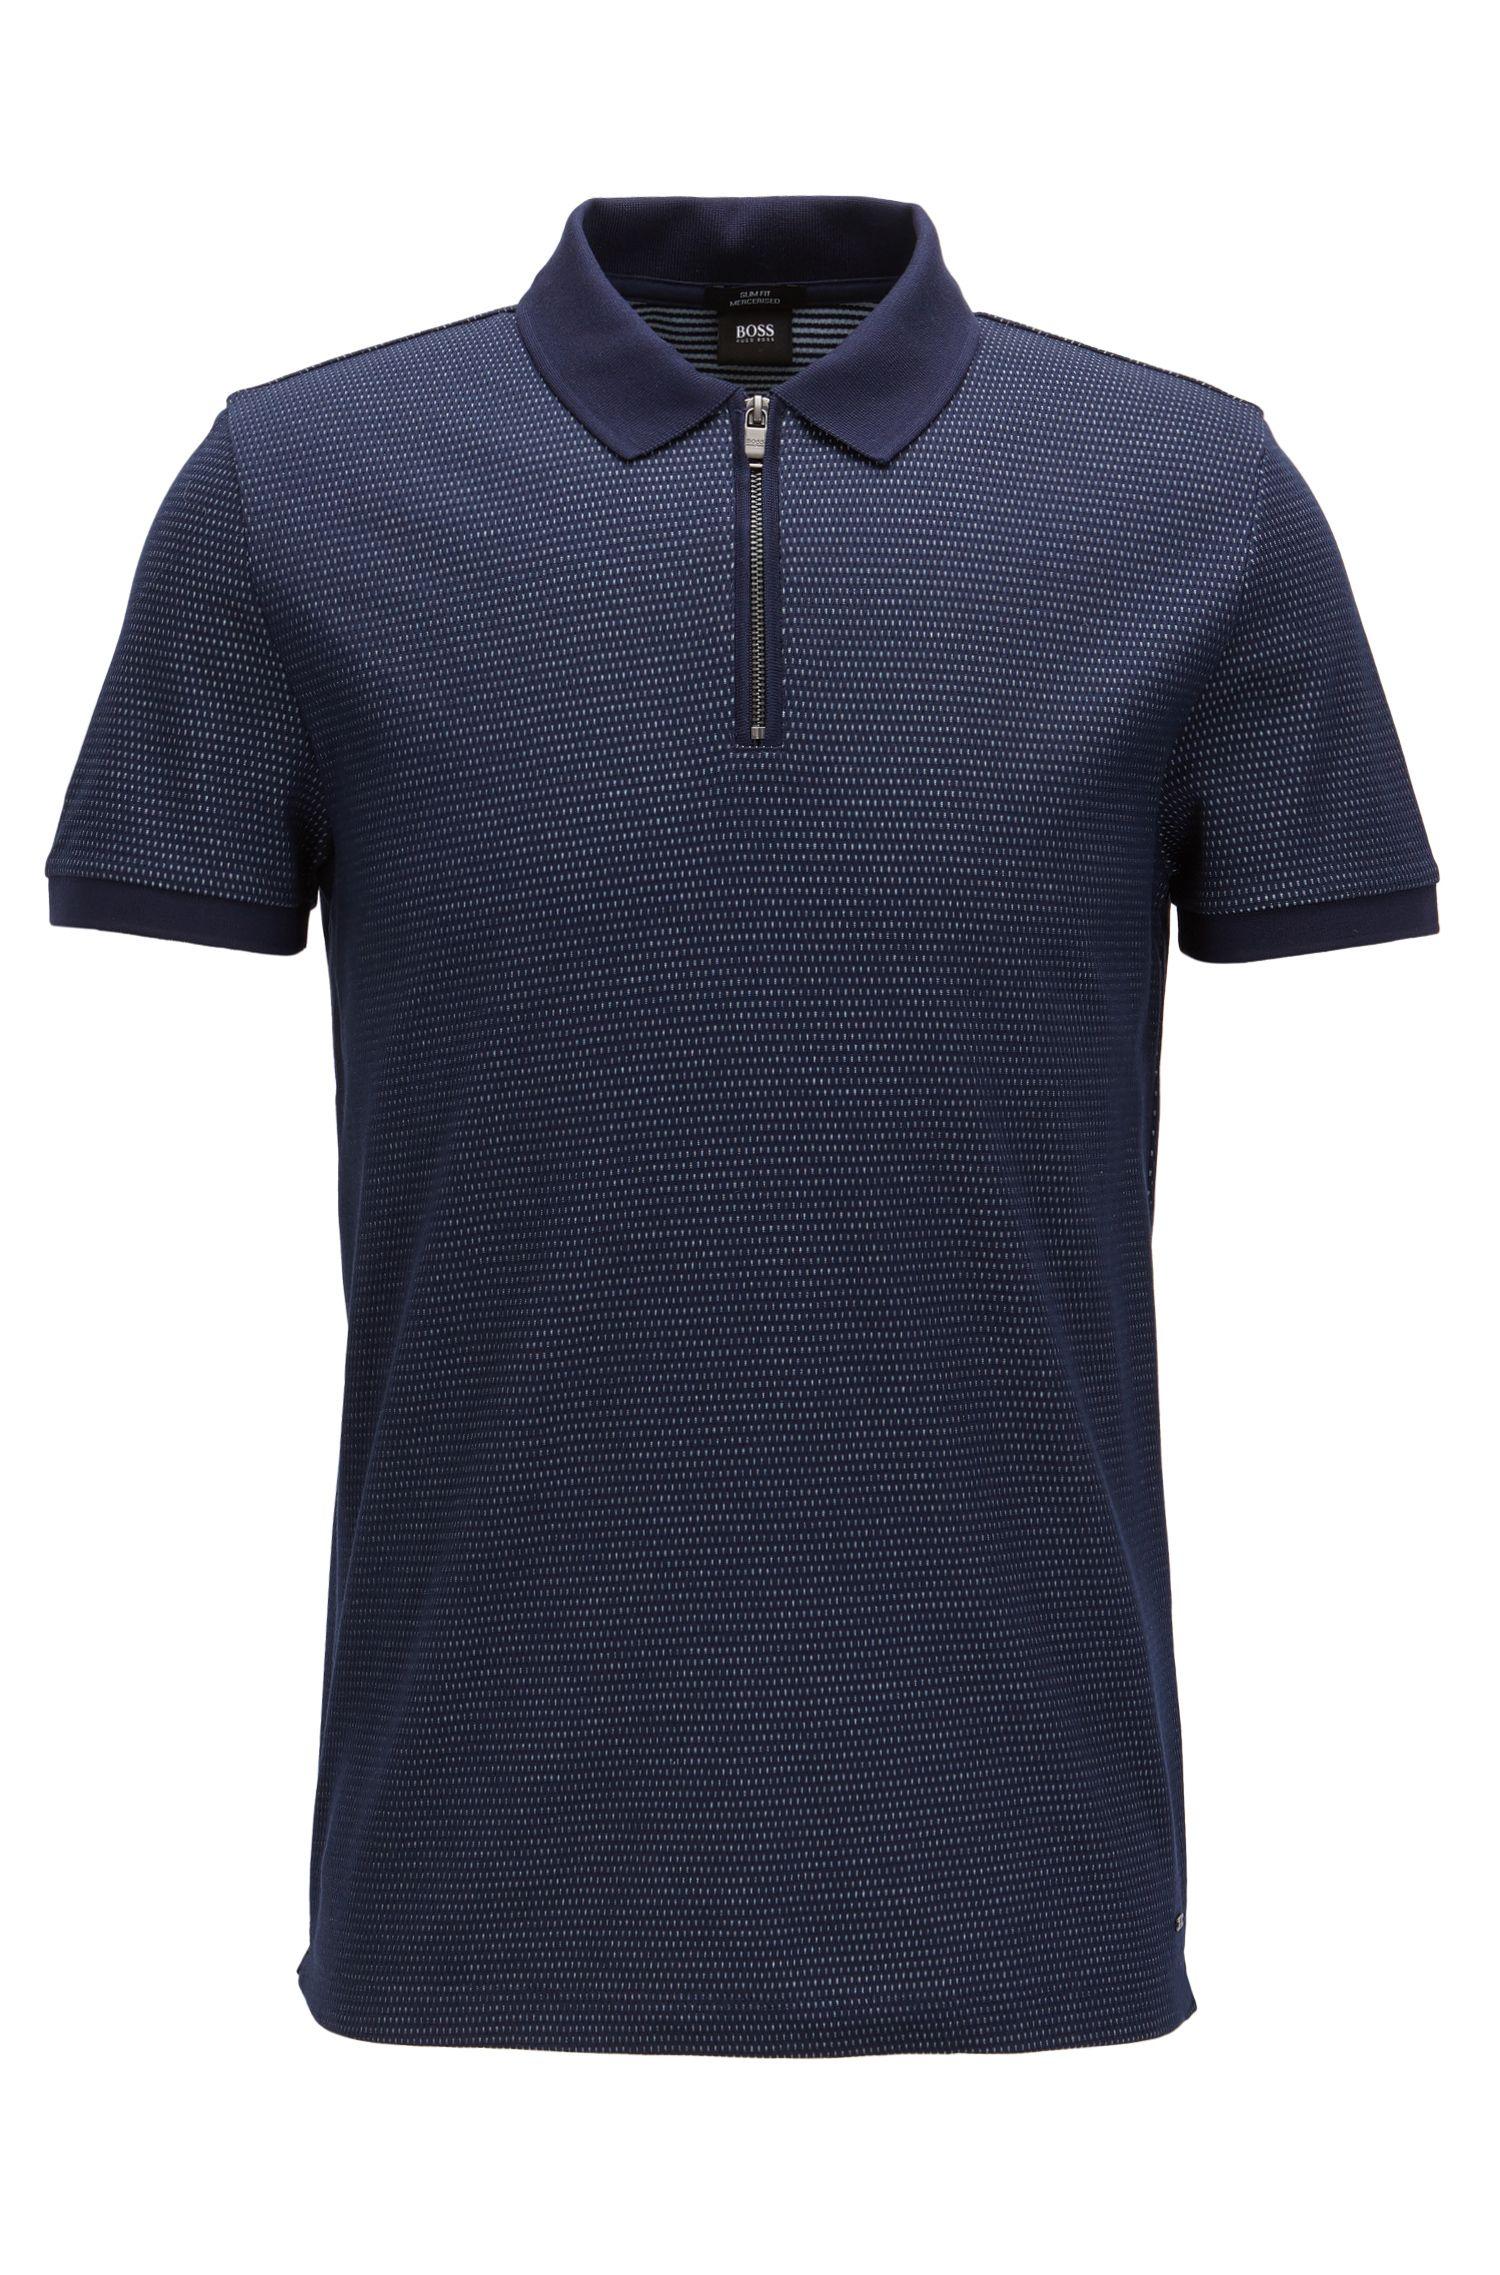 Jacquard Mercerized Cotton Polo Shirt, Slim Fit | Polston